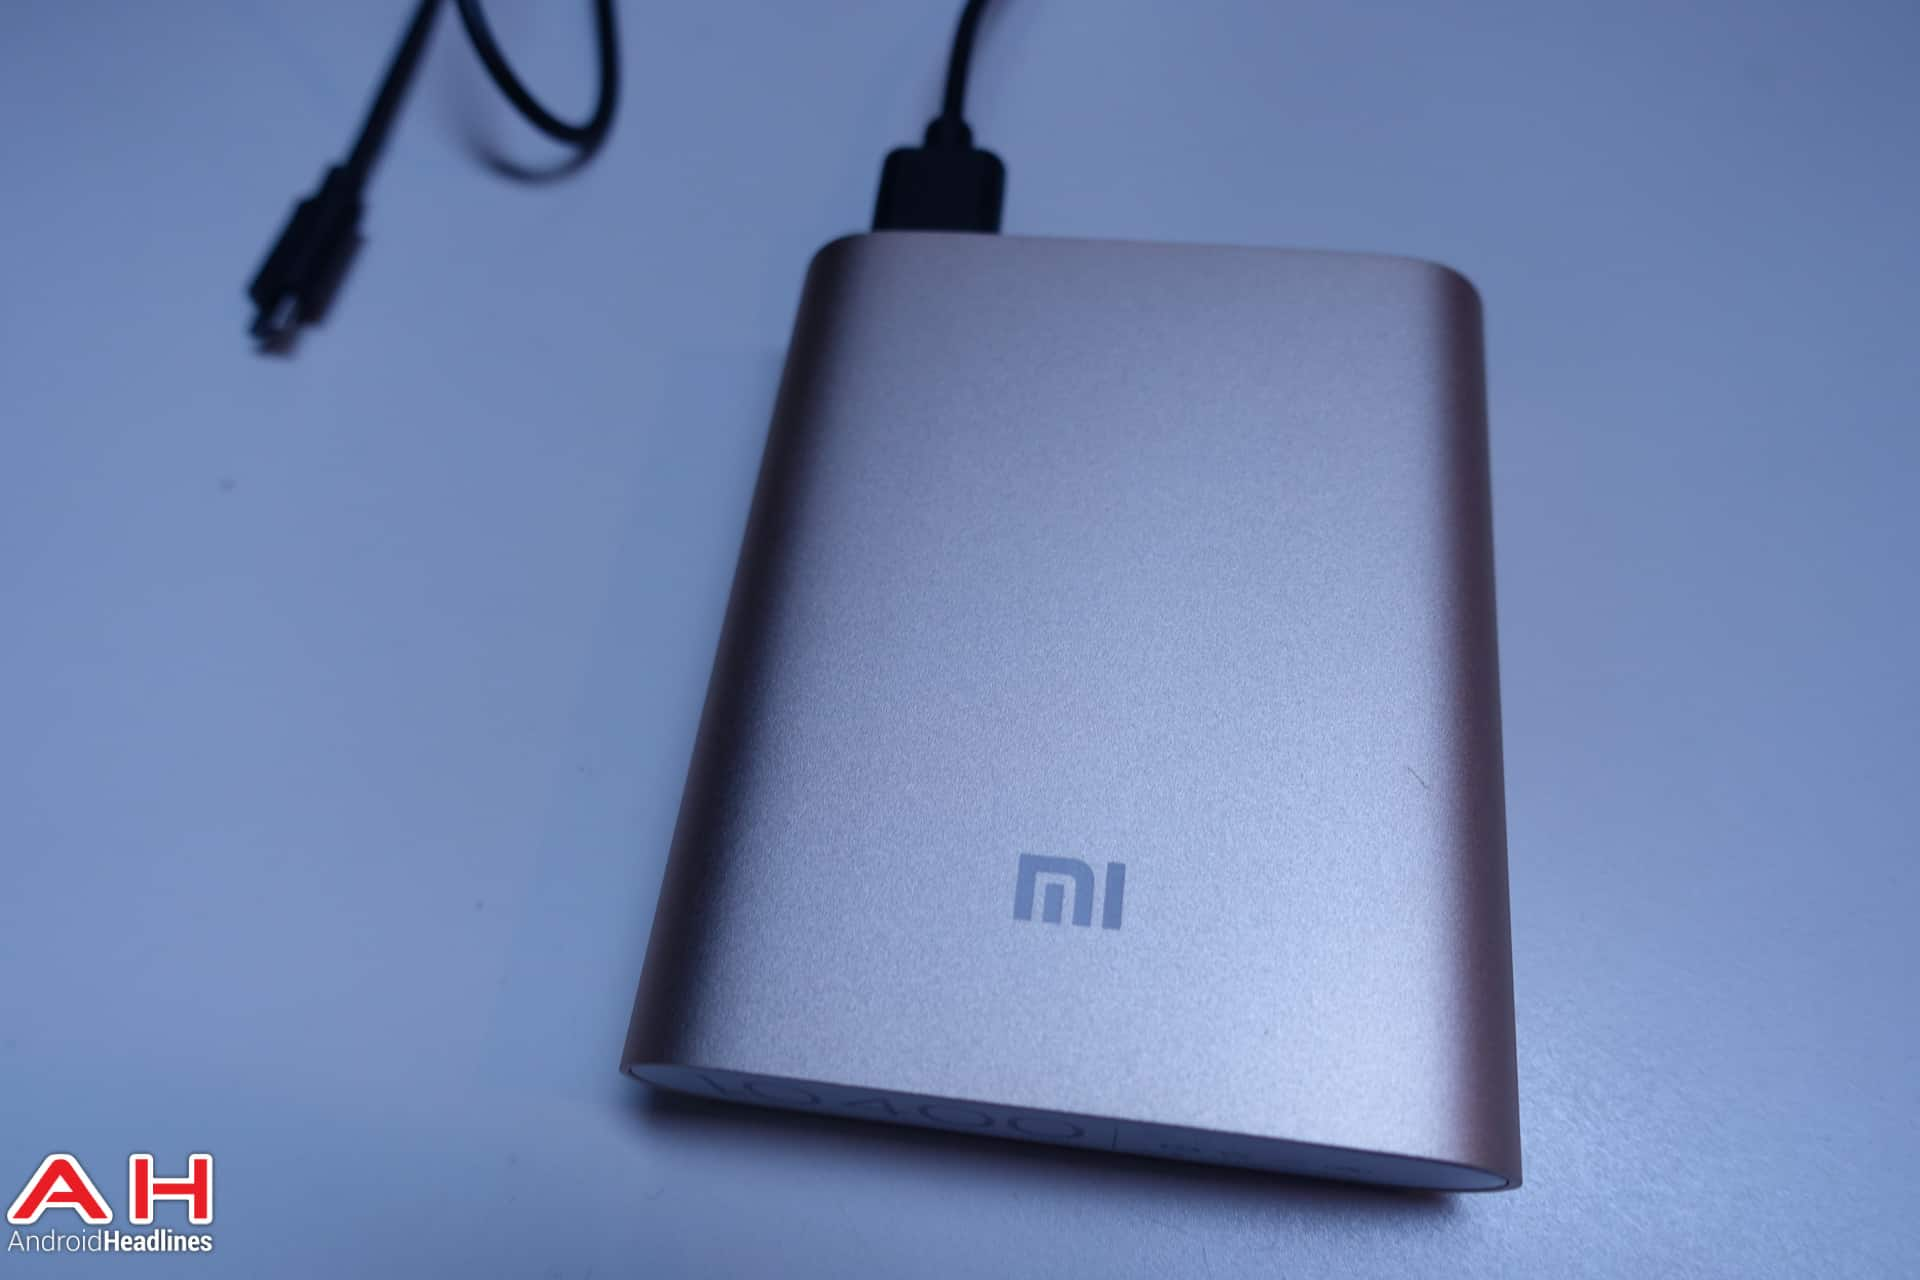 Xiaomi Mi Power Bank AH 03844